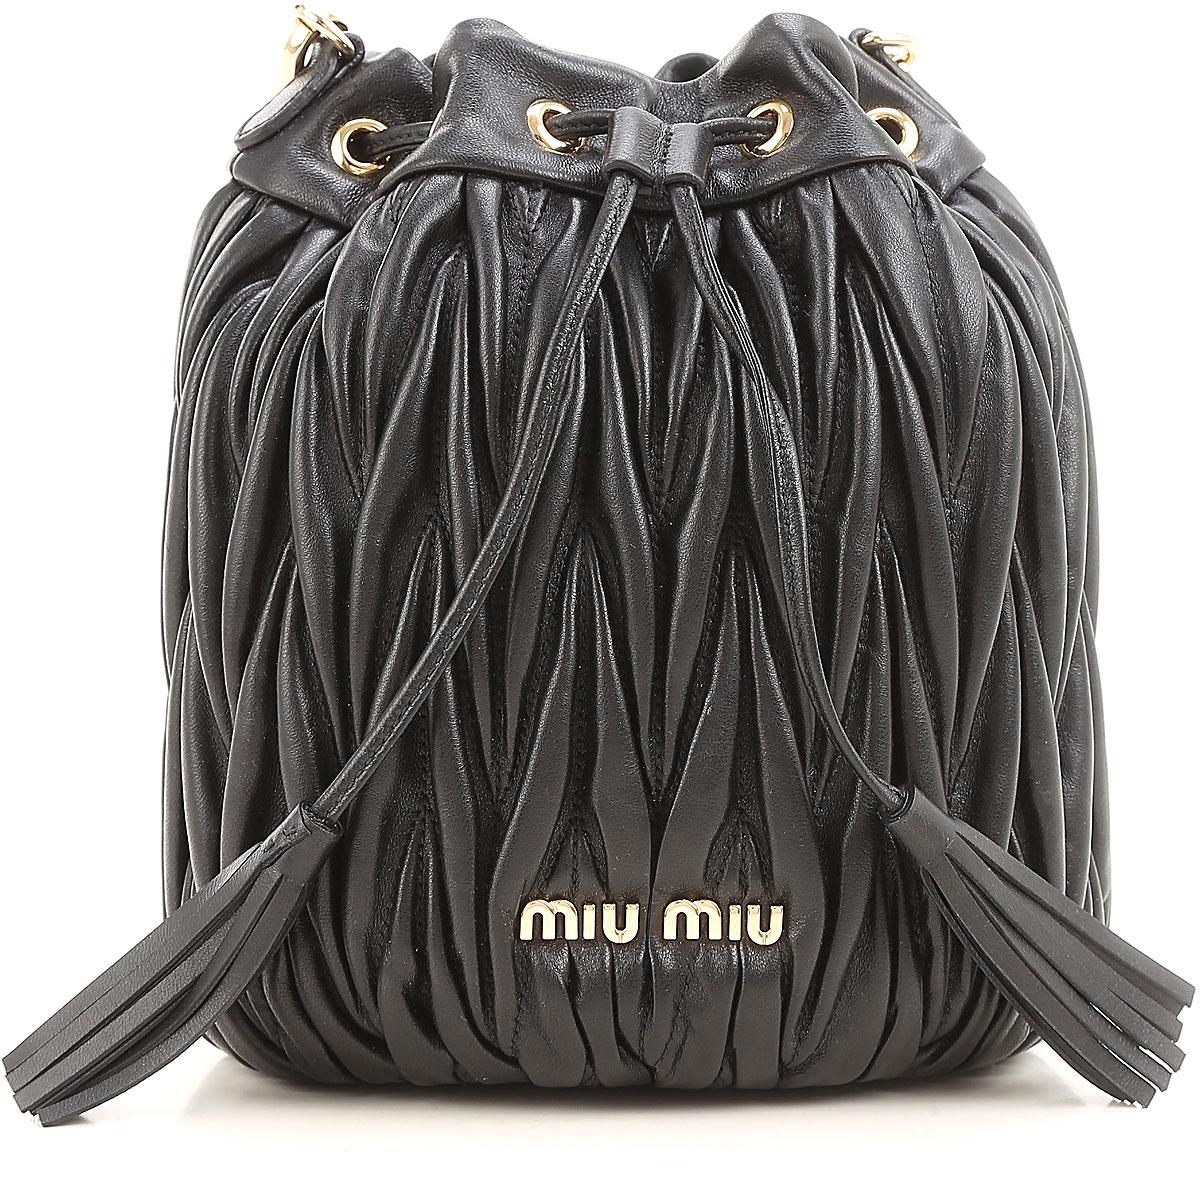 eb8594b0c9a ... Miu Handbags. FULL SCREEN. 1) Drag to view product 2) Double click to  start rotation